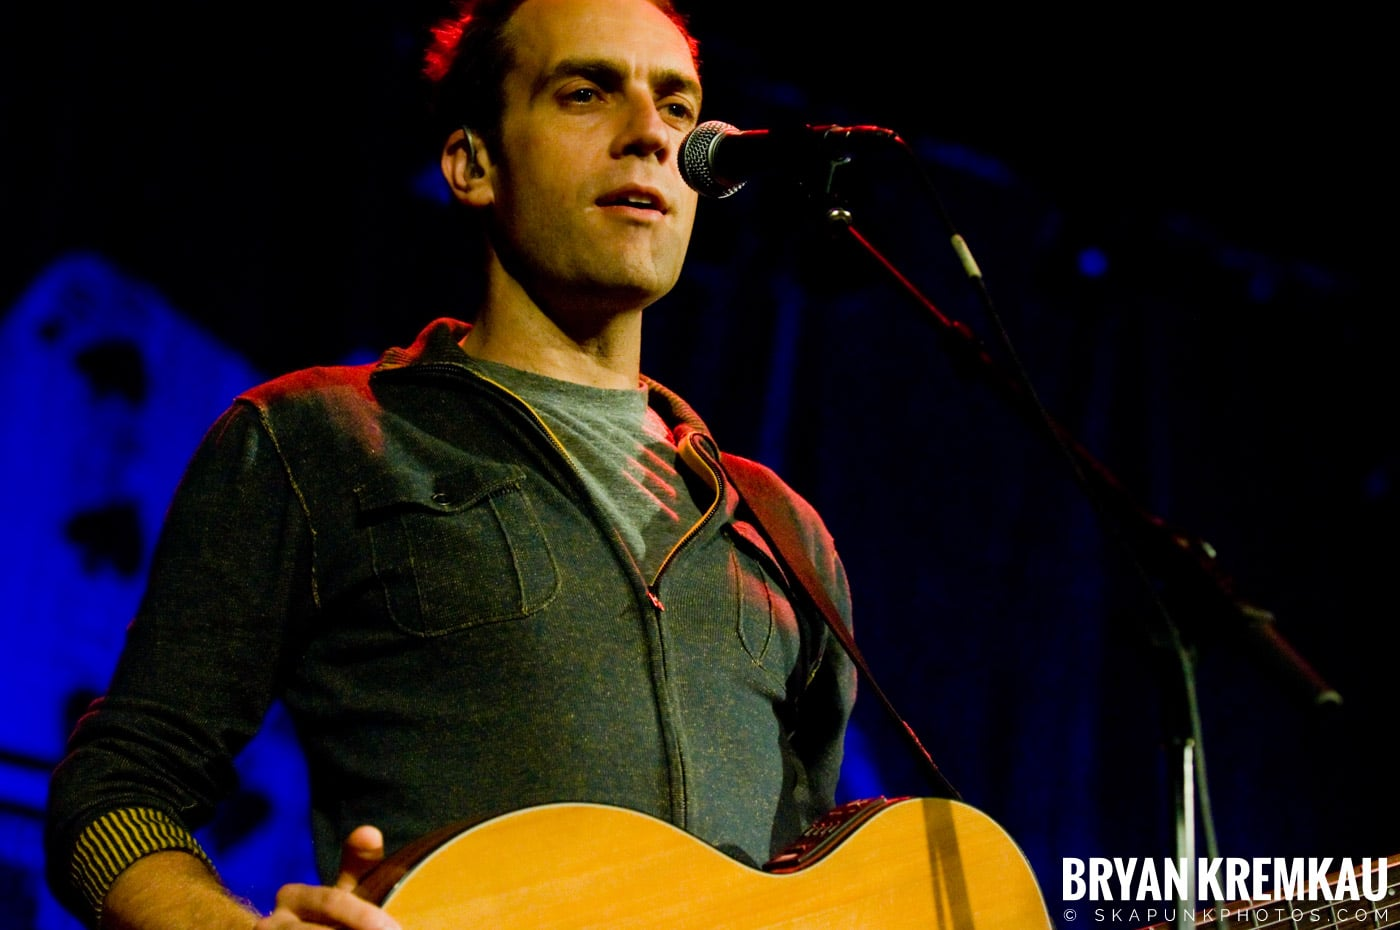 Great Big Sea @ Tarrytown Music Hall, Tarrytown, NY - 10.10.09 (20)